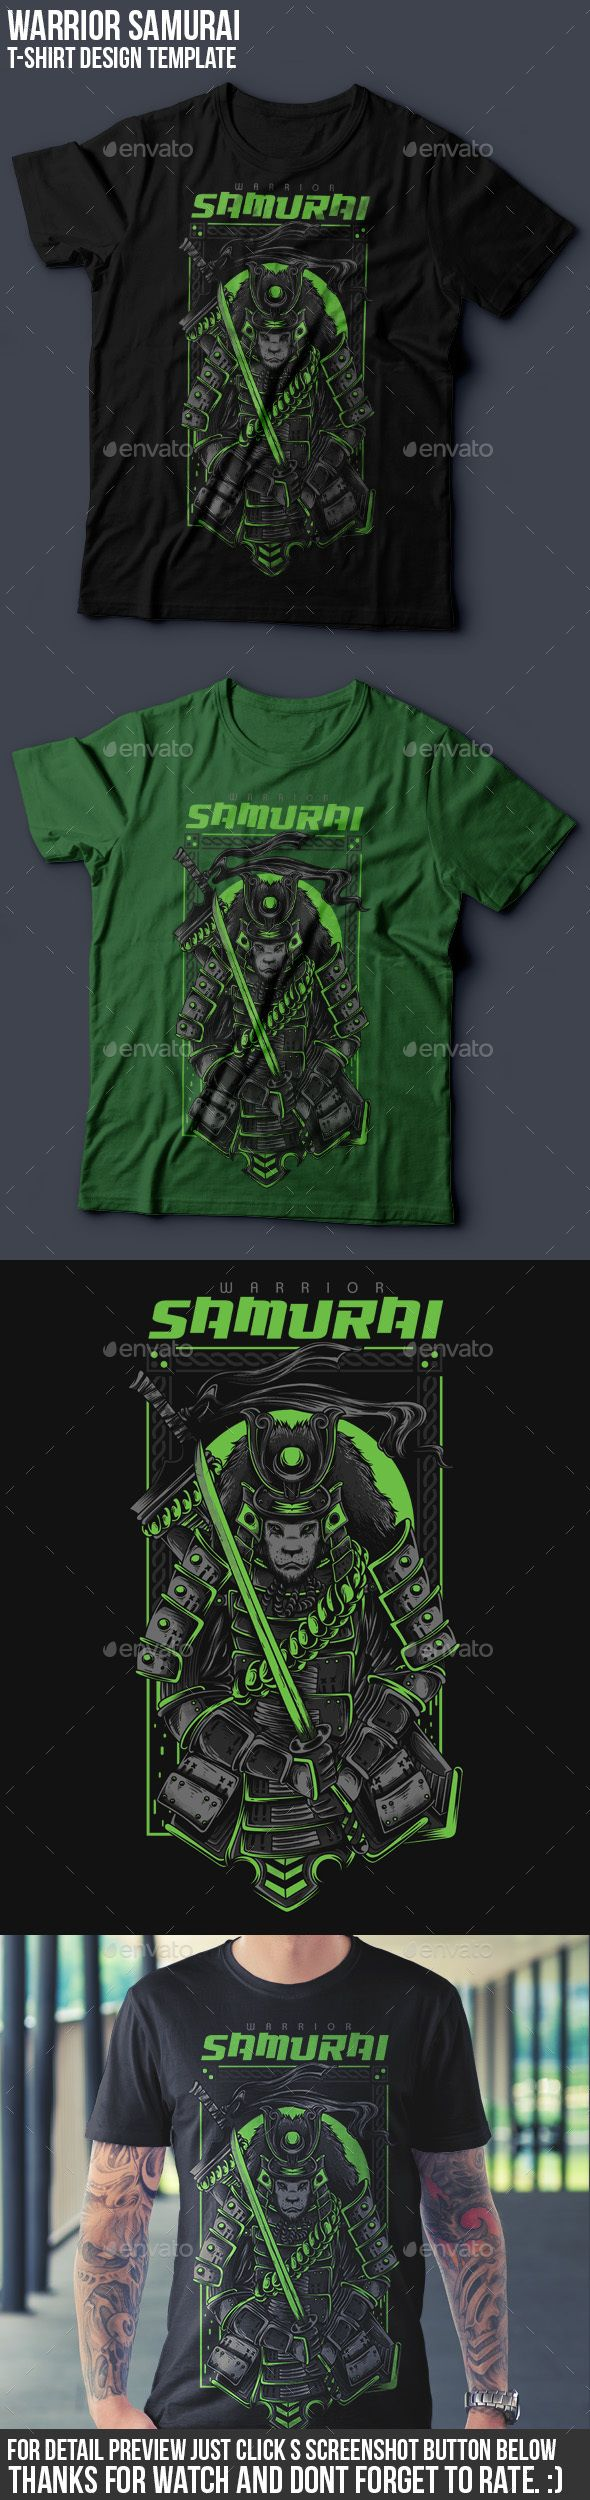 Shirt design eps - Samurai Warrior T Shirt Design